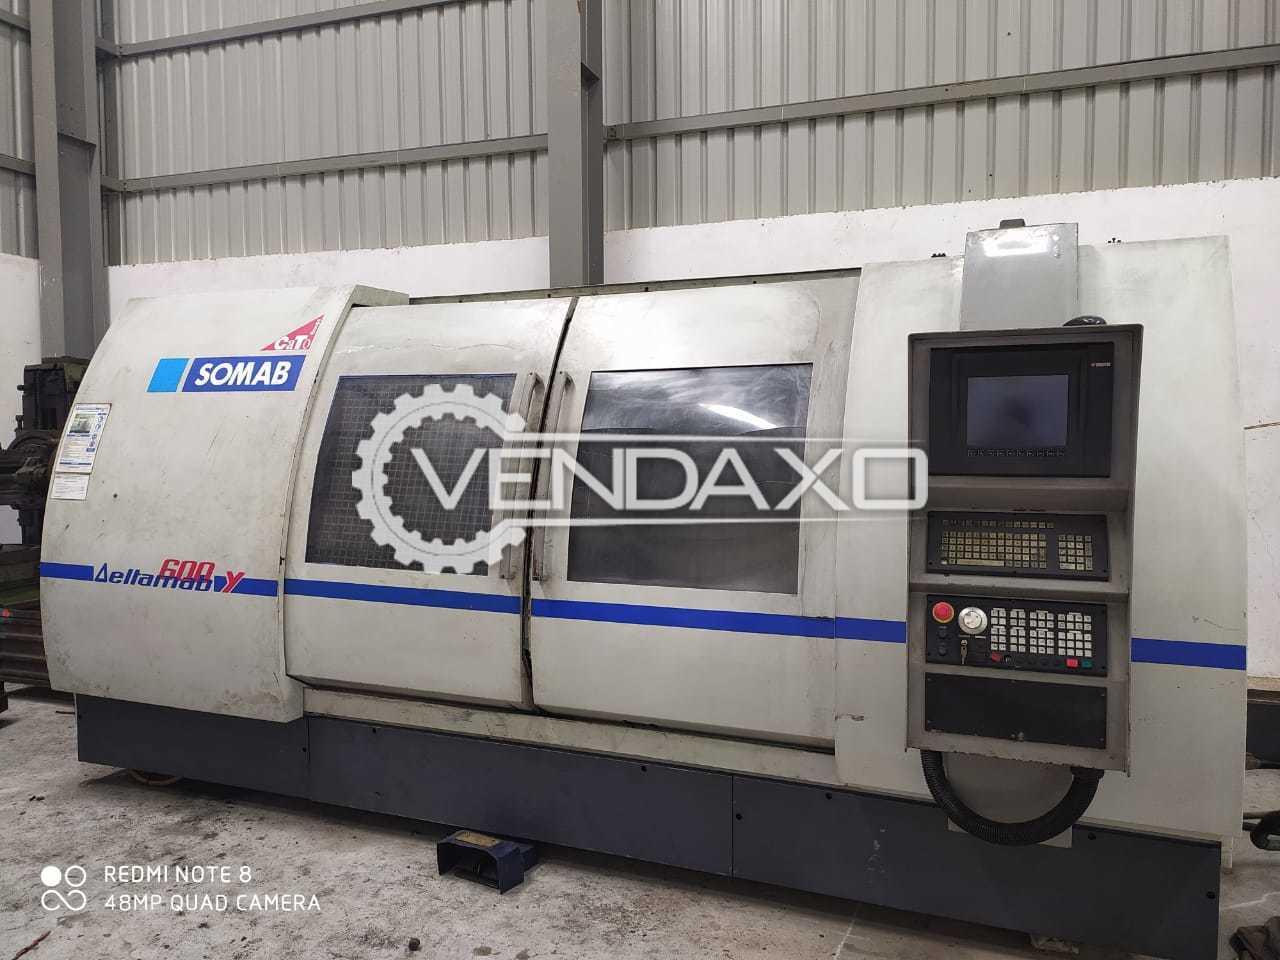 Somab Deltamab 600Y CNC Turn Mill Center - Maximum Swing Diameter : 700 mm